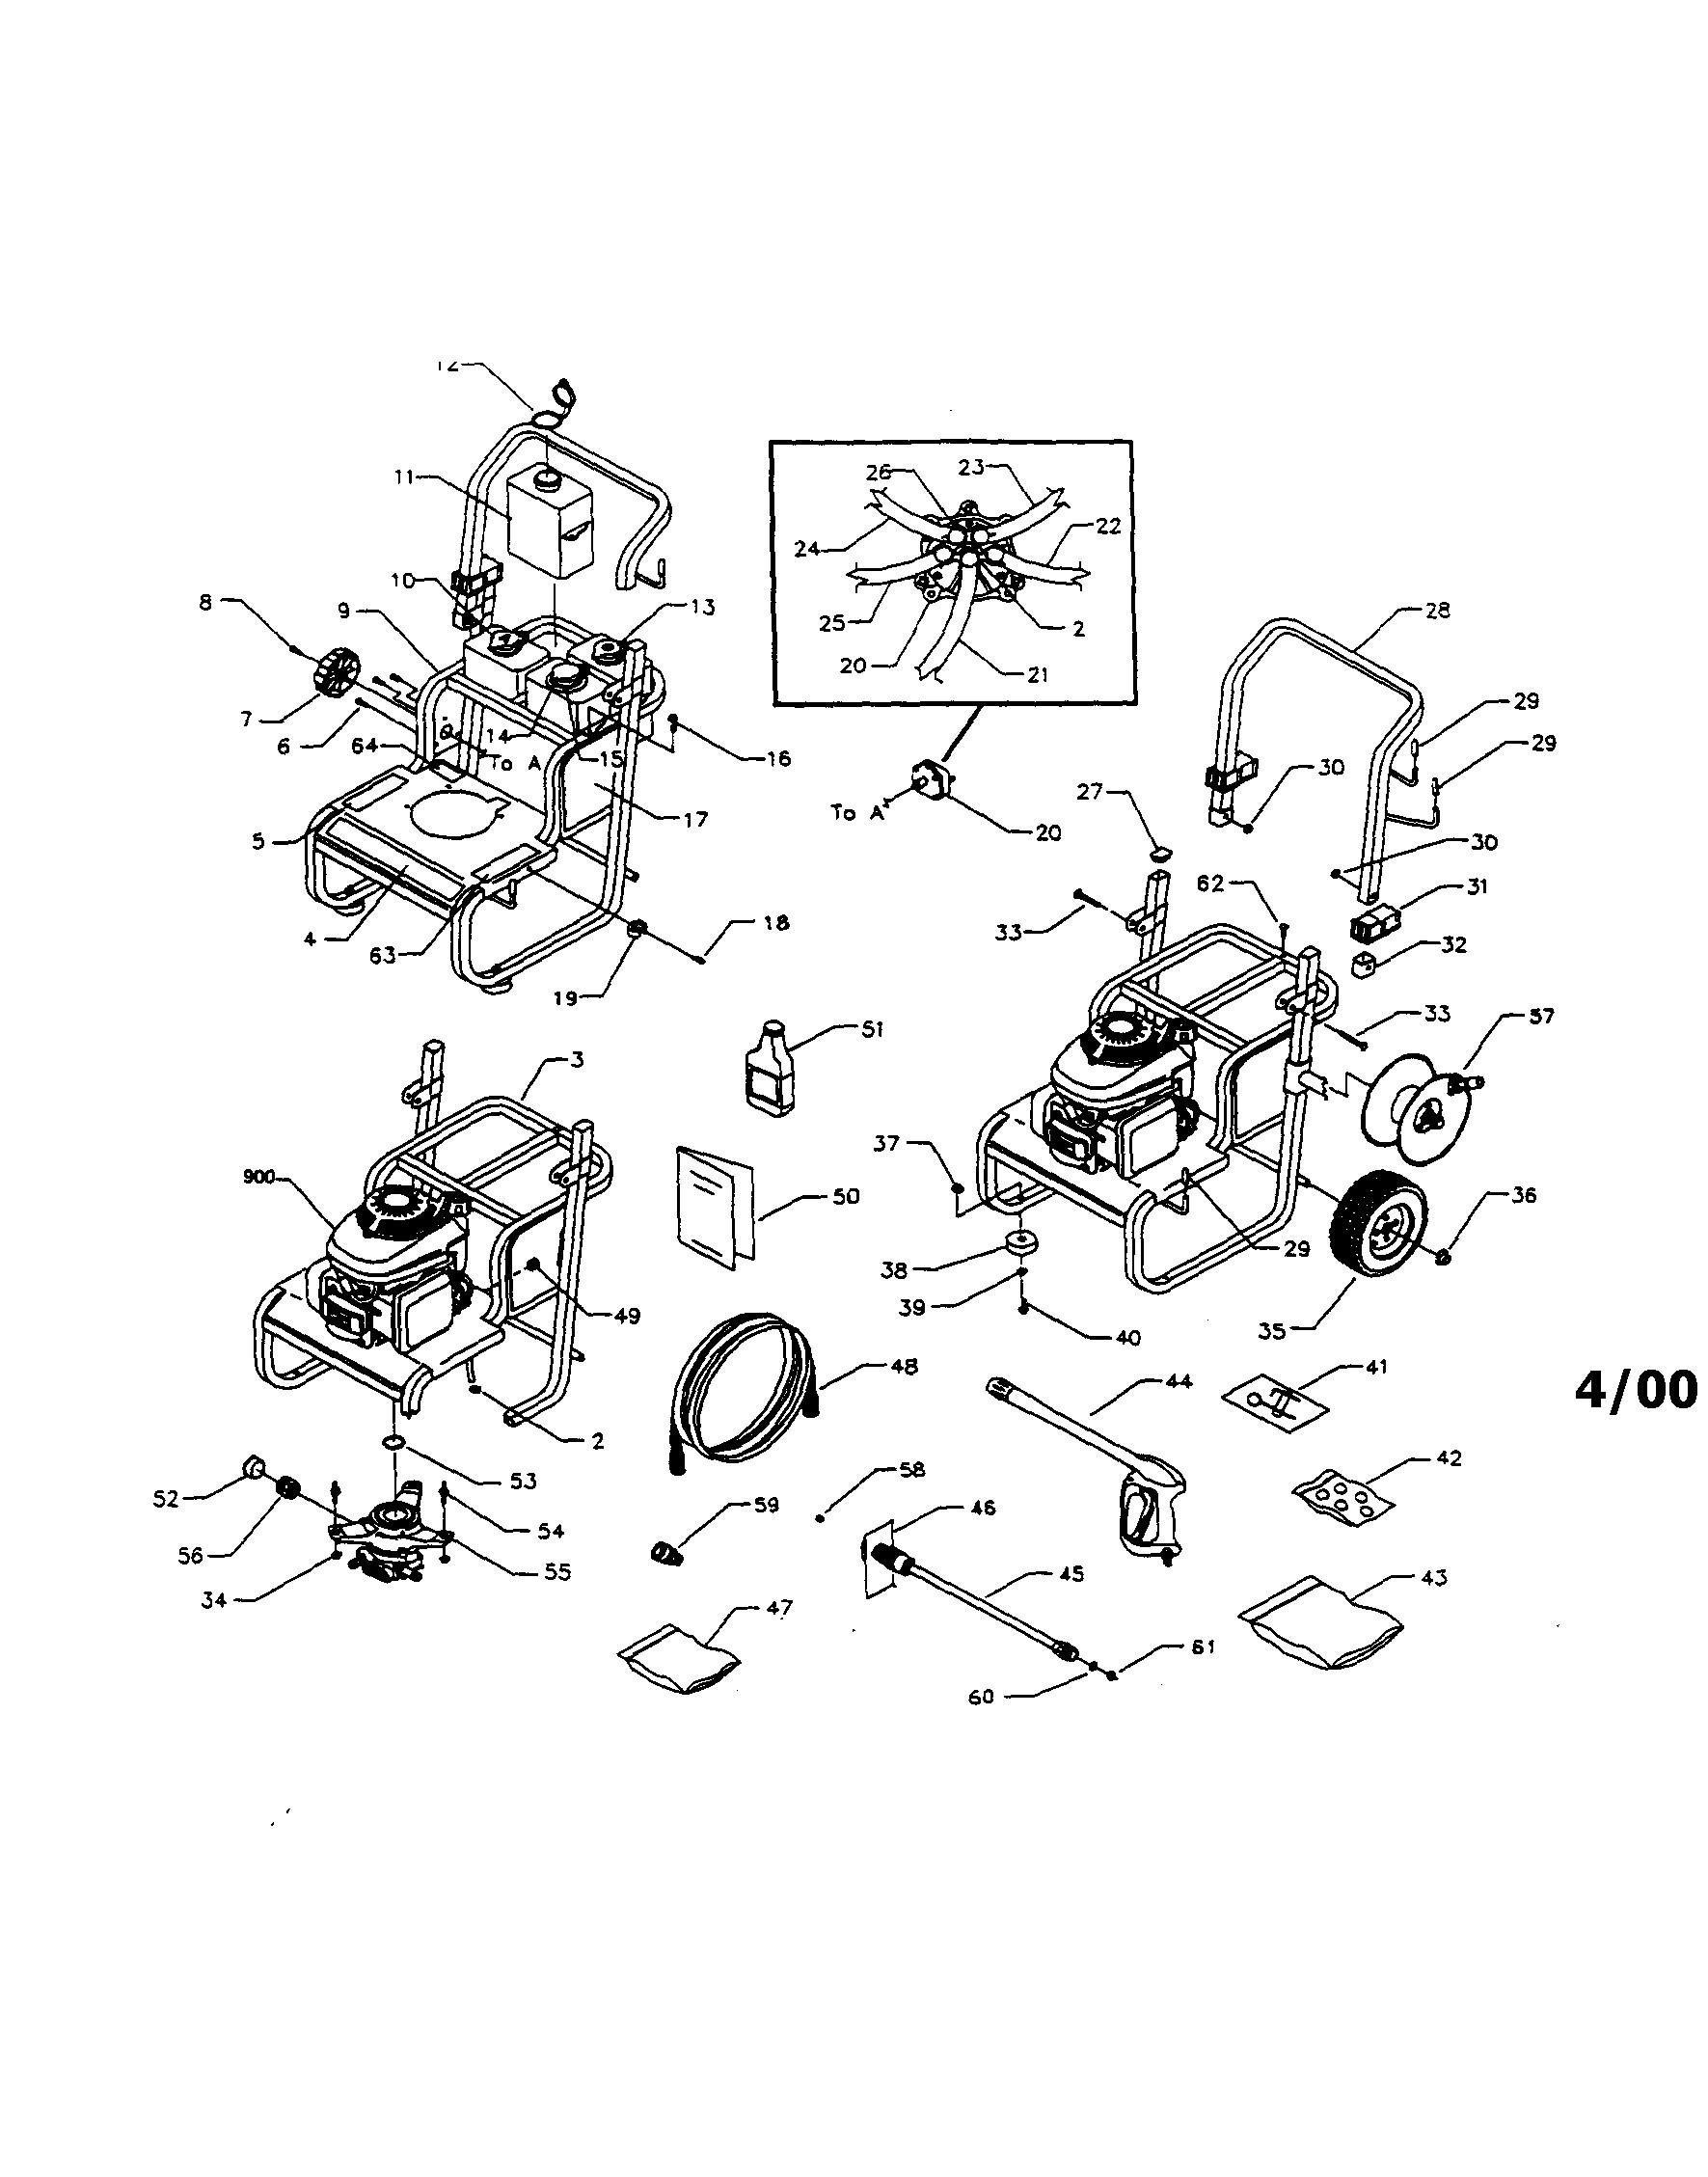 Honda gcv160 engine parts diagram honda gc160 parts diagram craftsman model power washer gas genuine of